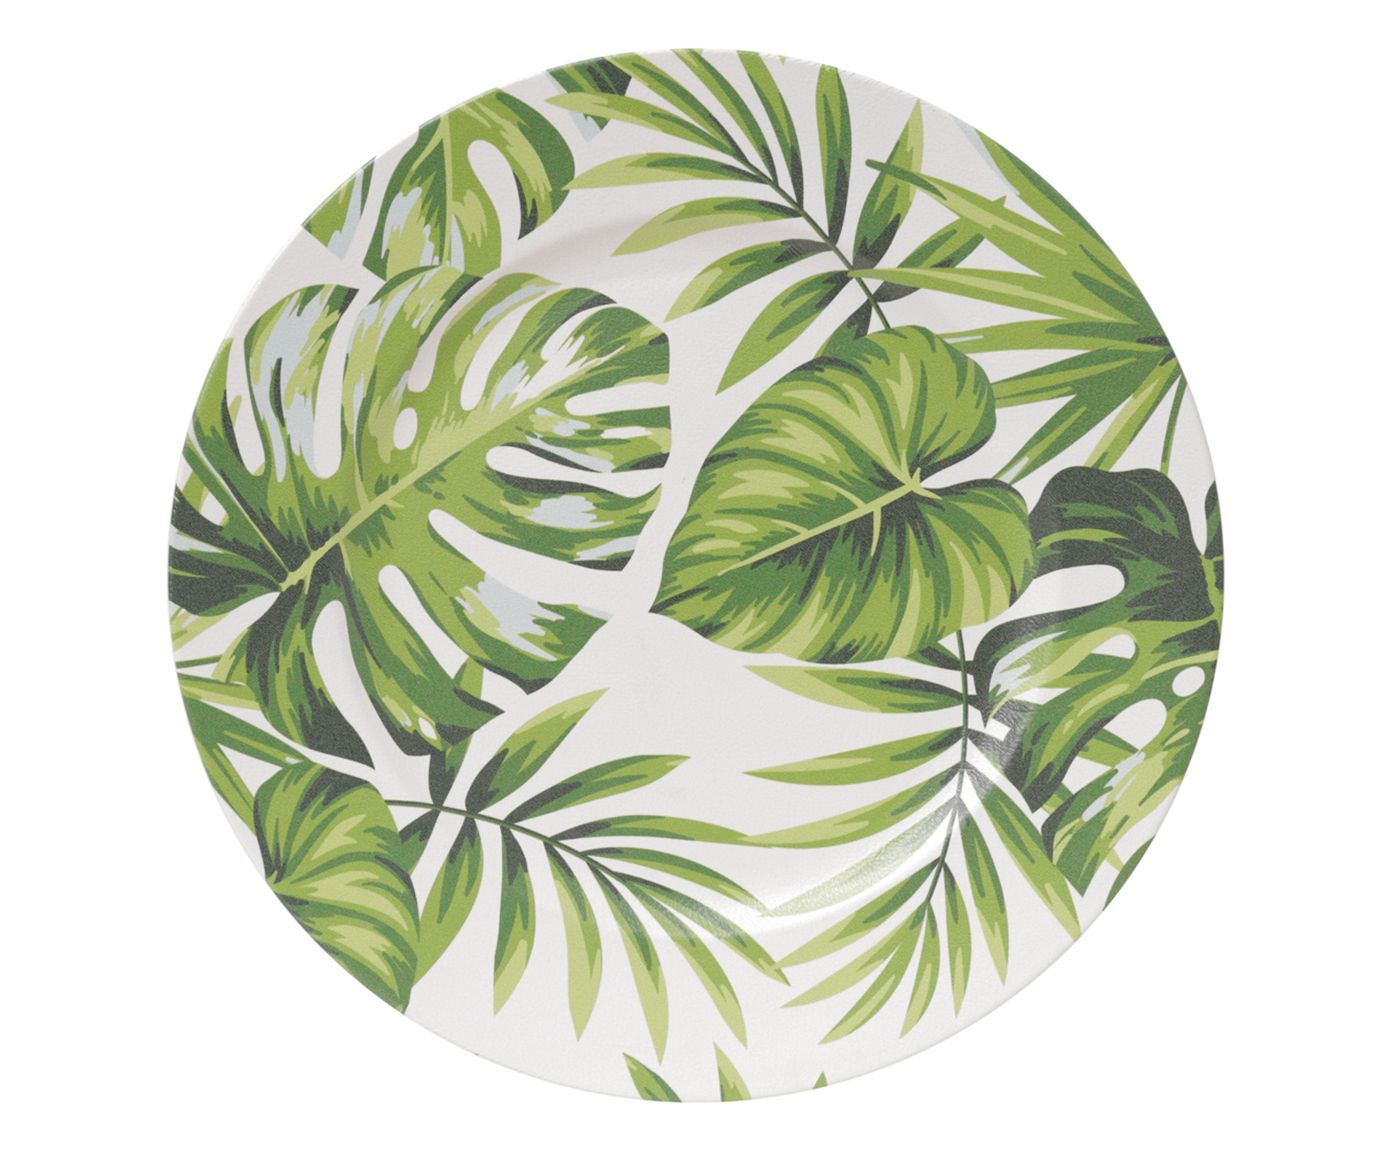 Sousplat Leaf - 33cm | Westwing.com.br